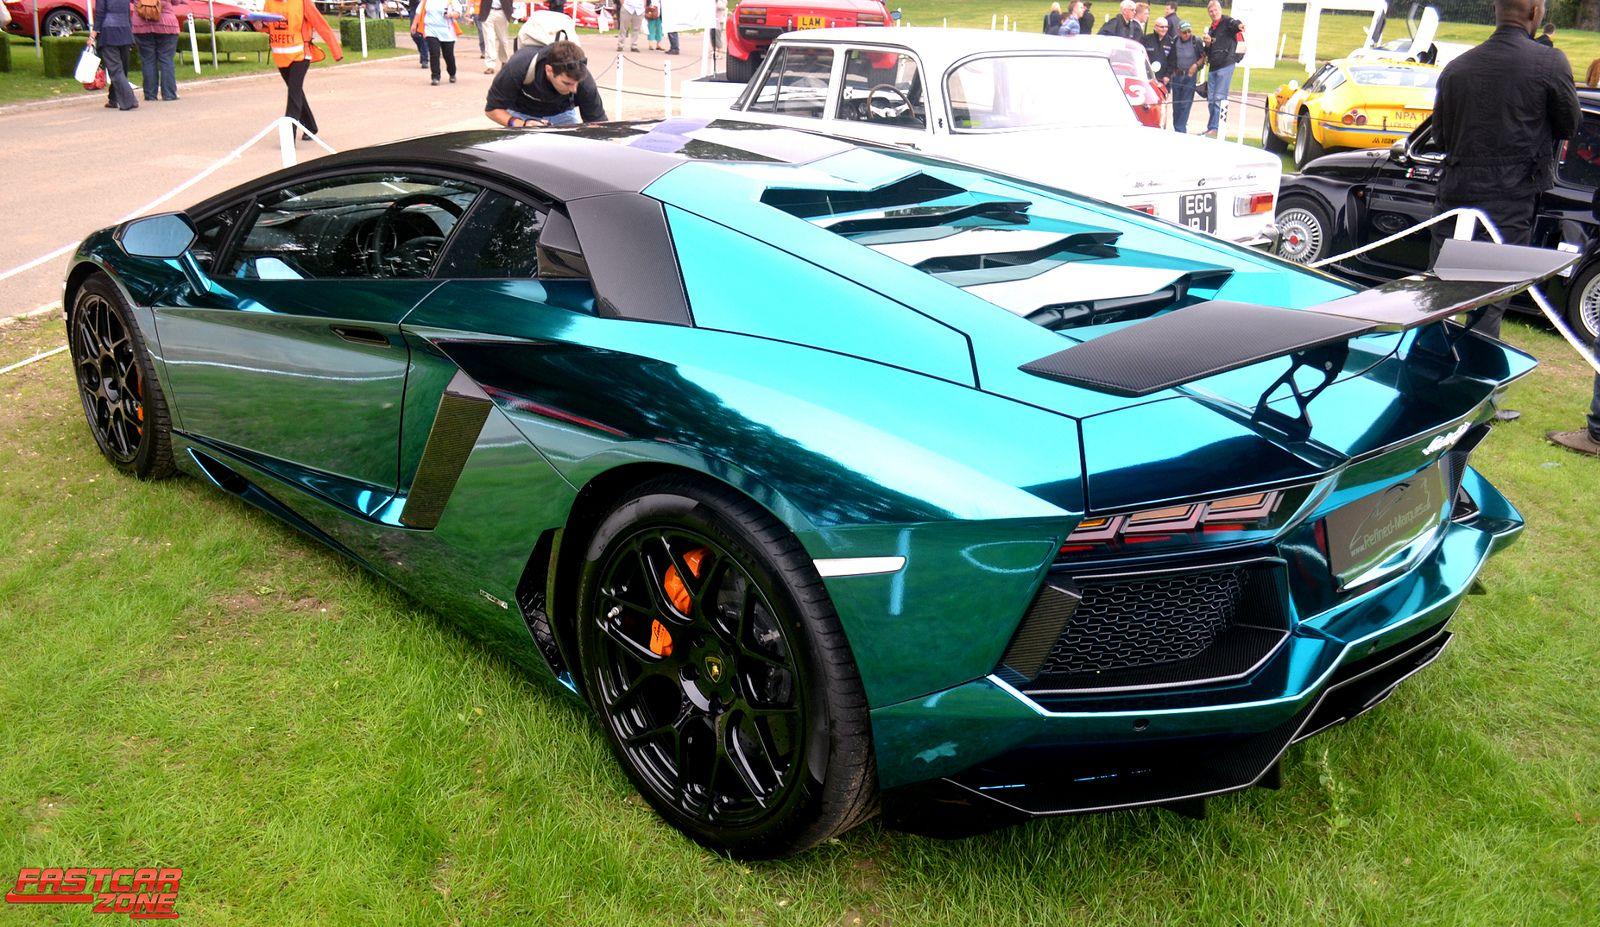 Lamborghini Aventador By Oakley Design Dragon Ed By Fast Car Zone Cool Cars Amazing Cars Lamborghini Cars